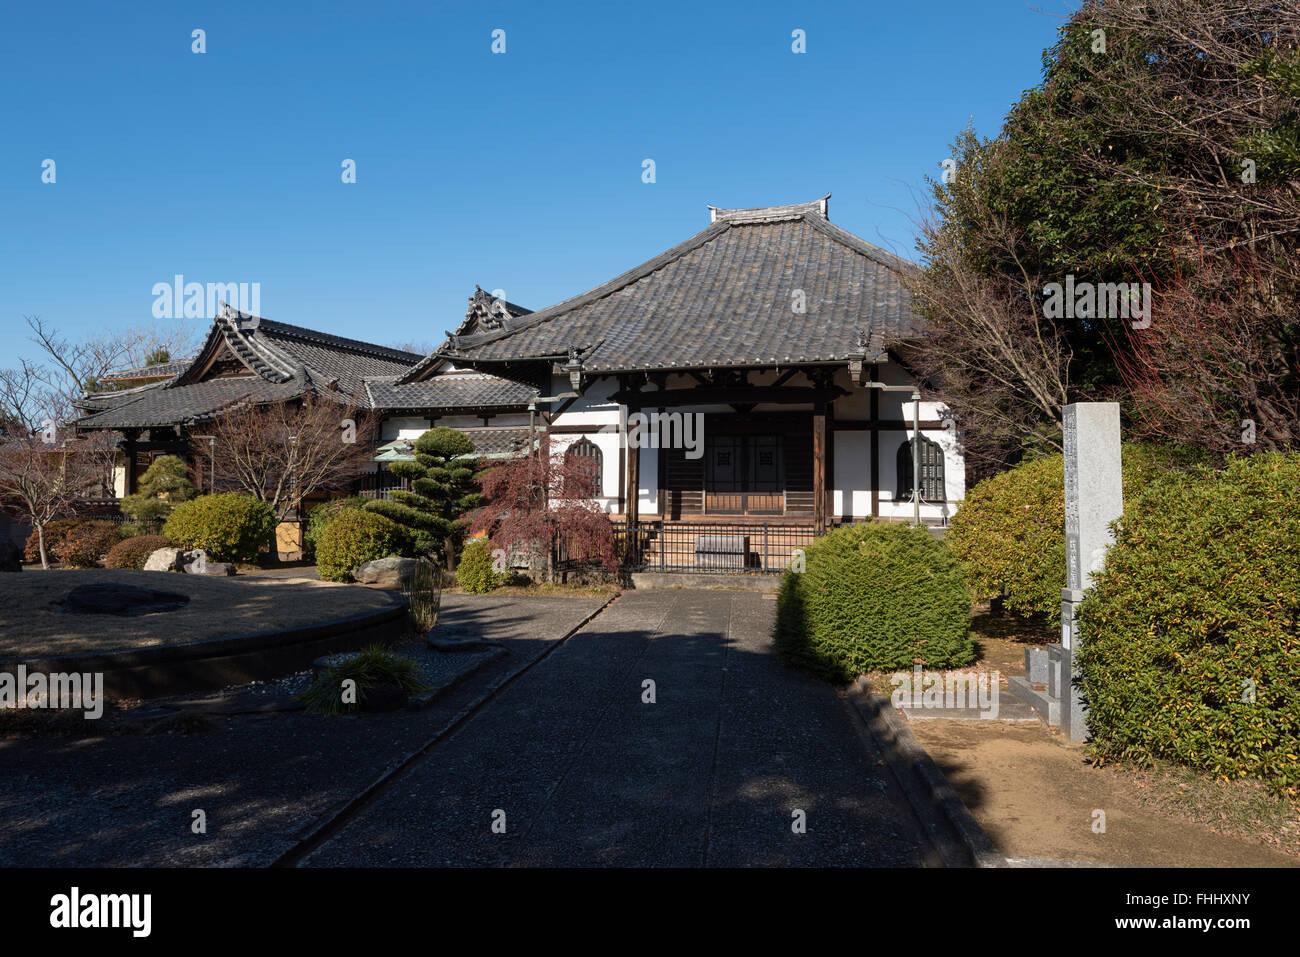 Tokyo, Japan - January 09, 2016:  Enmei-ji Temple in Yanaka, Tokyo - Japan. - Stock Image